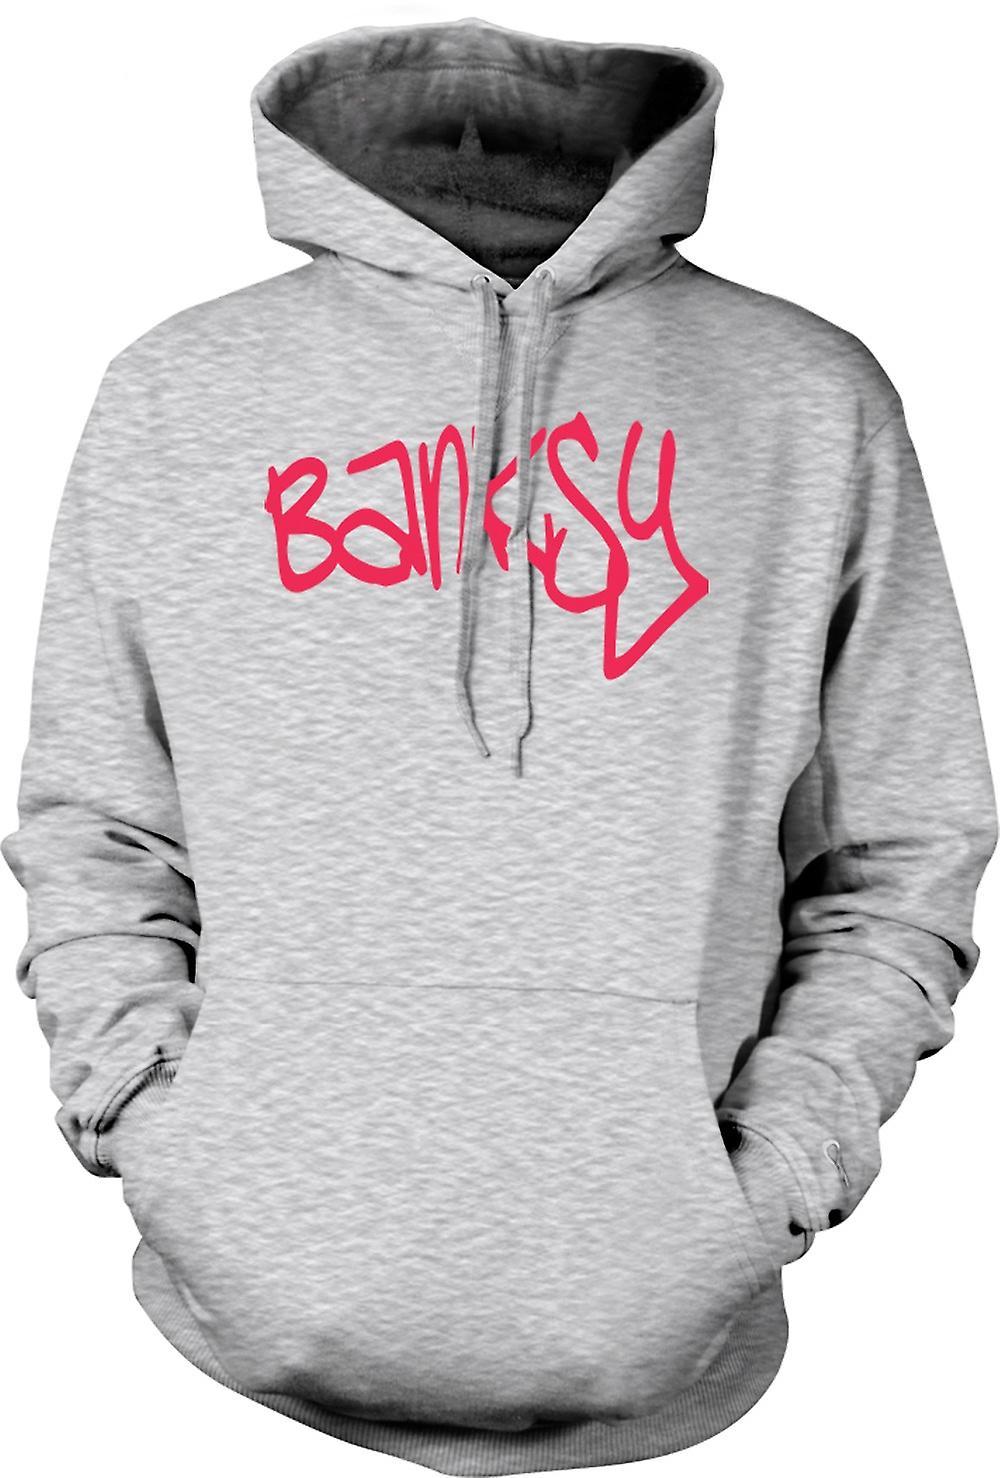 Mens Hoodie - Banksy Graffiti Artist